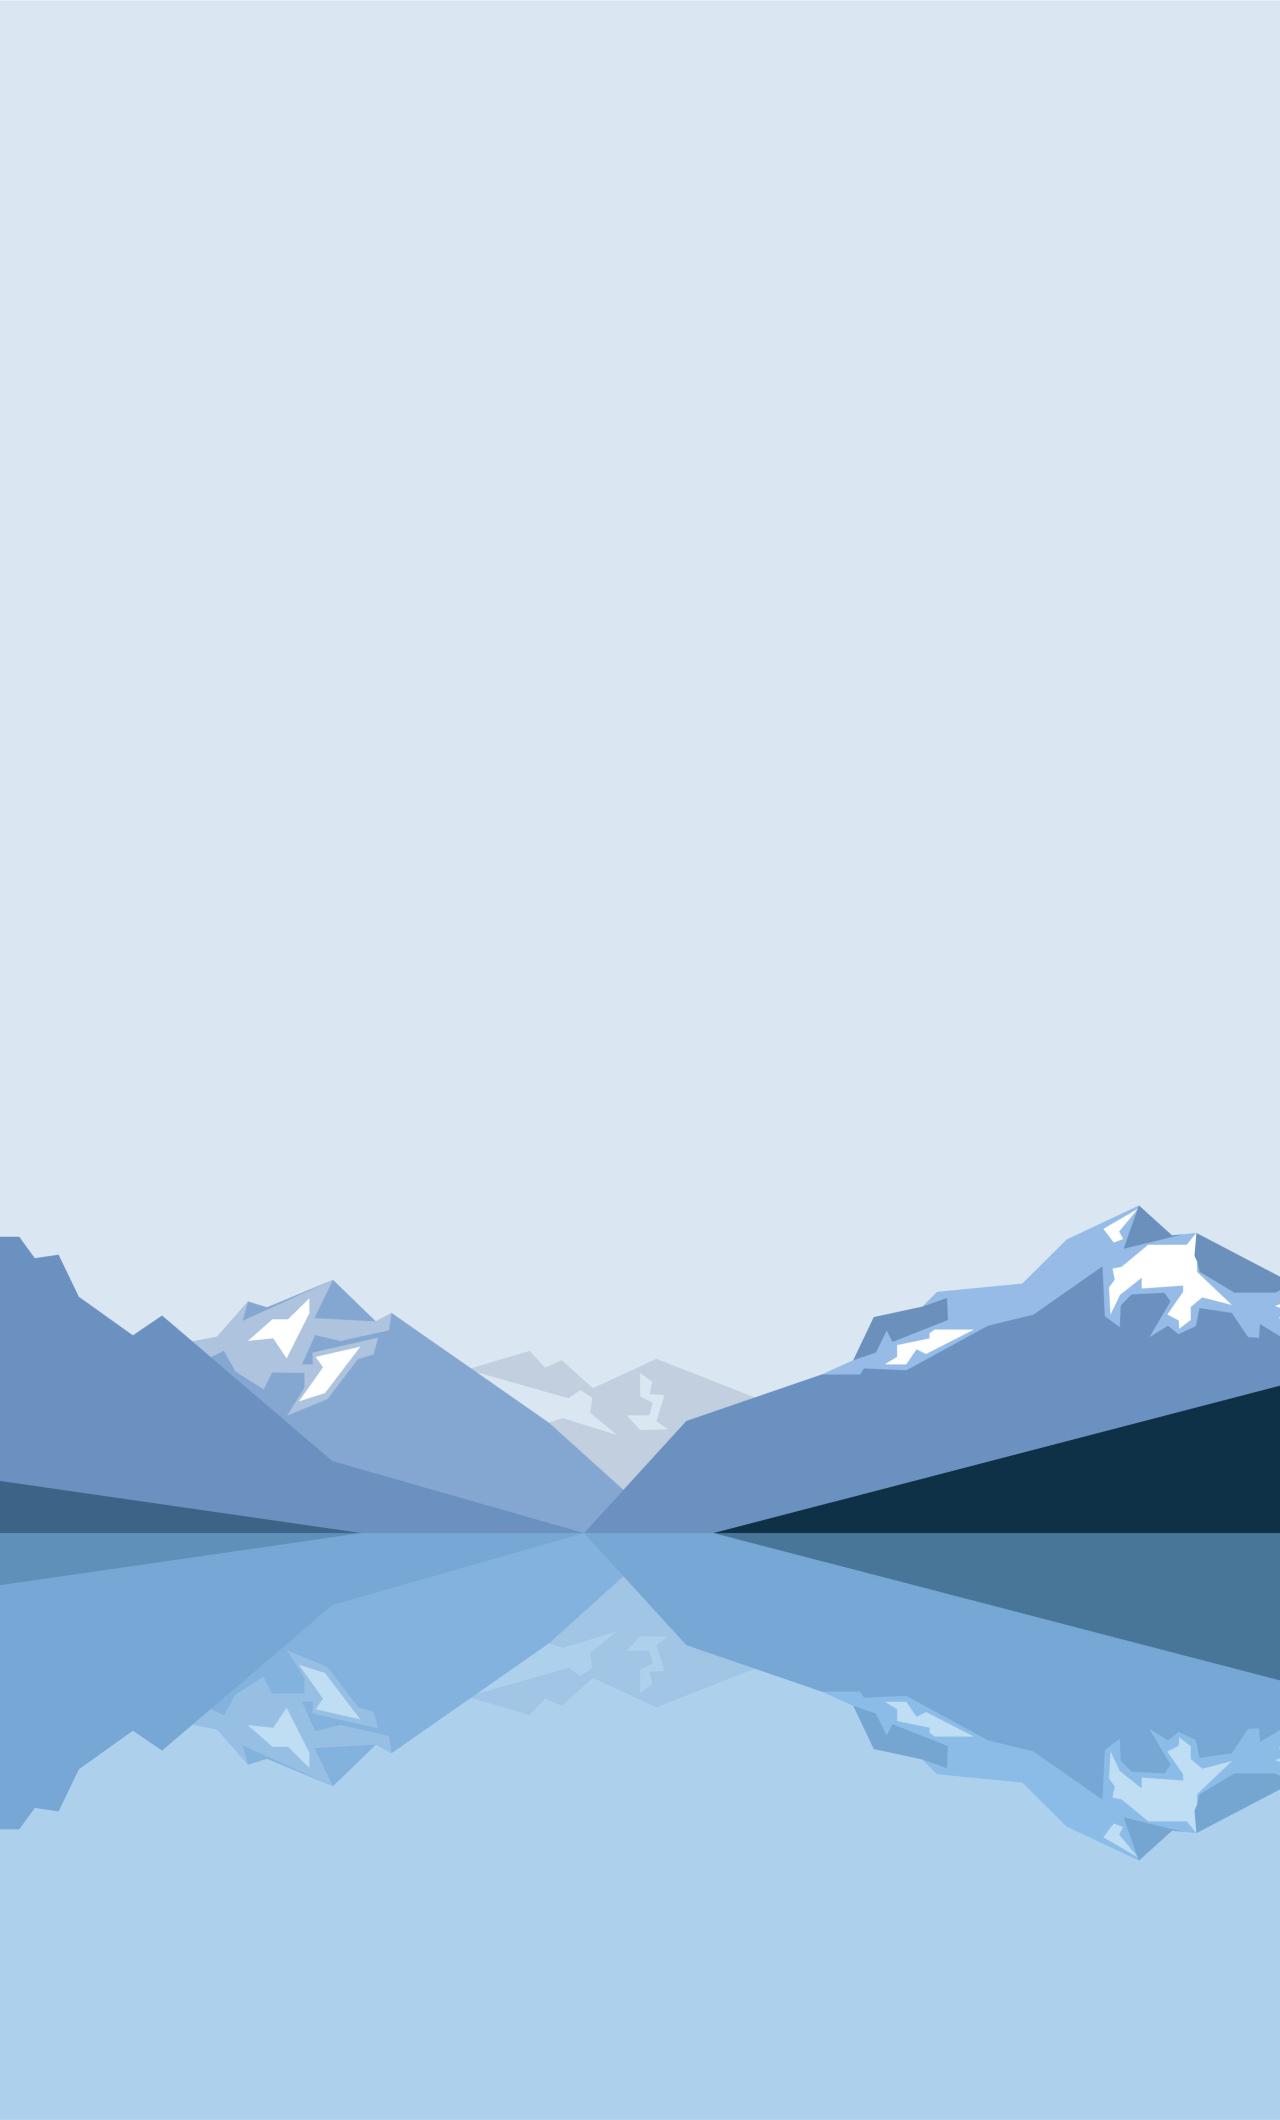 Minimalist blue mountains hd 8k wallpaper - 8k minimal wallpaper ...